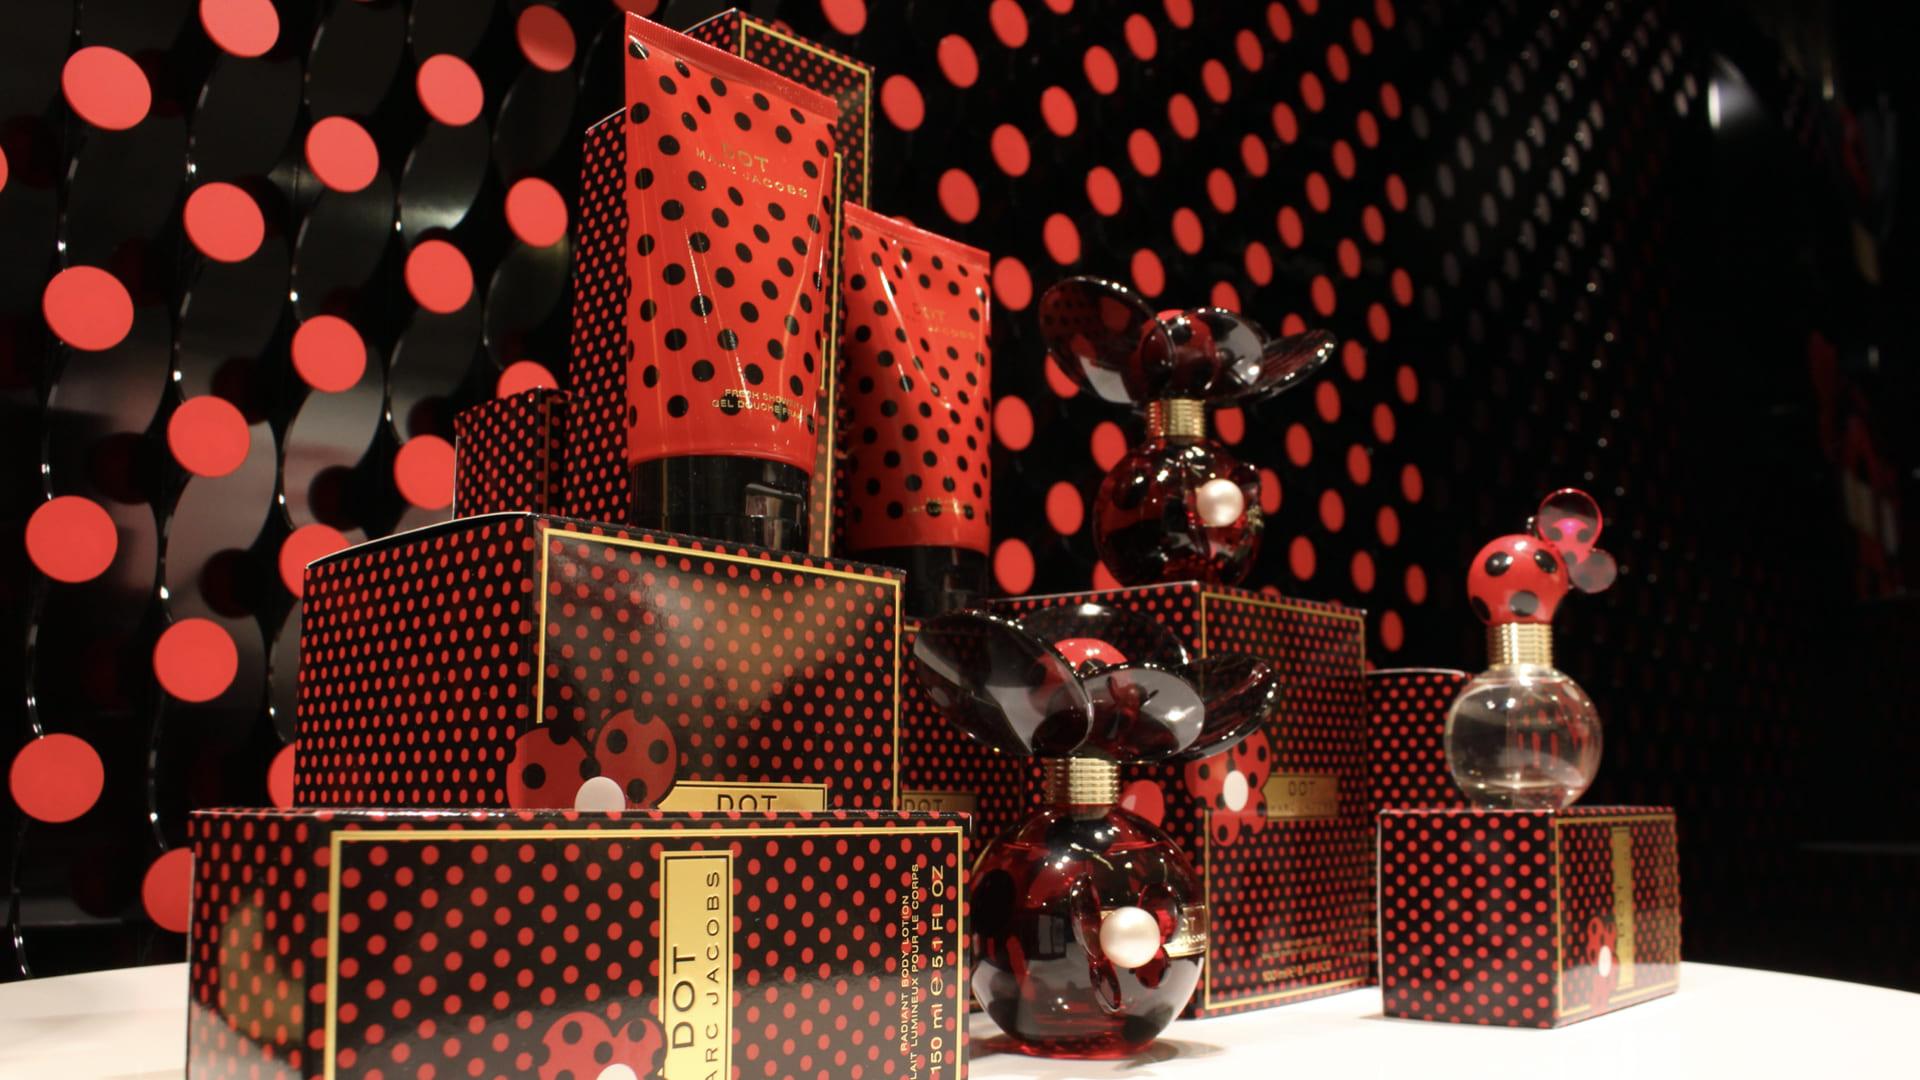 DOT Perfume Window Product Placement LIGANOVA